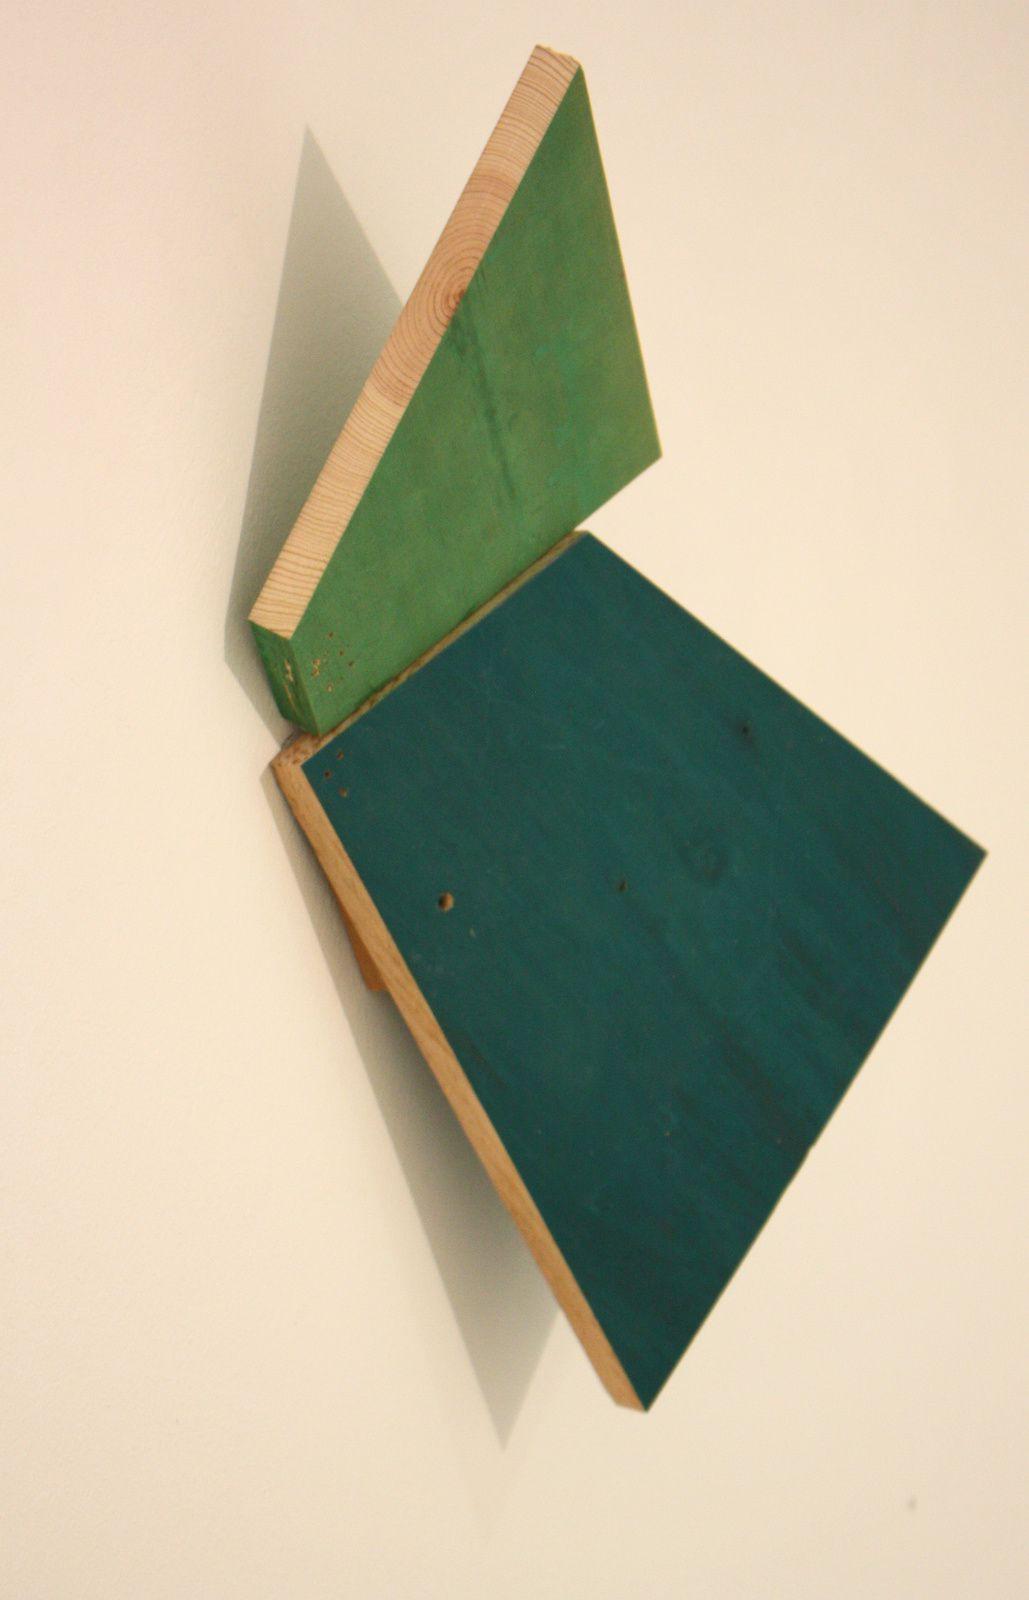 Joël SHAPIRO Courtesy Galerie Karsten Greve Paris